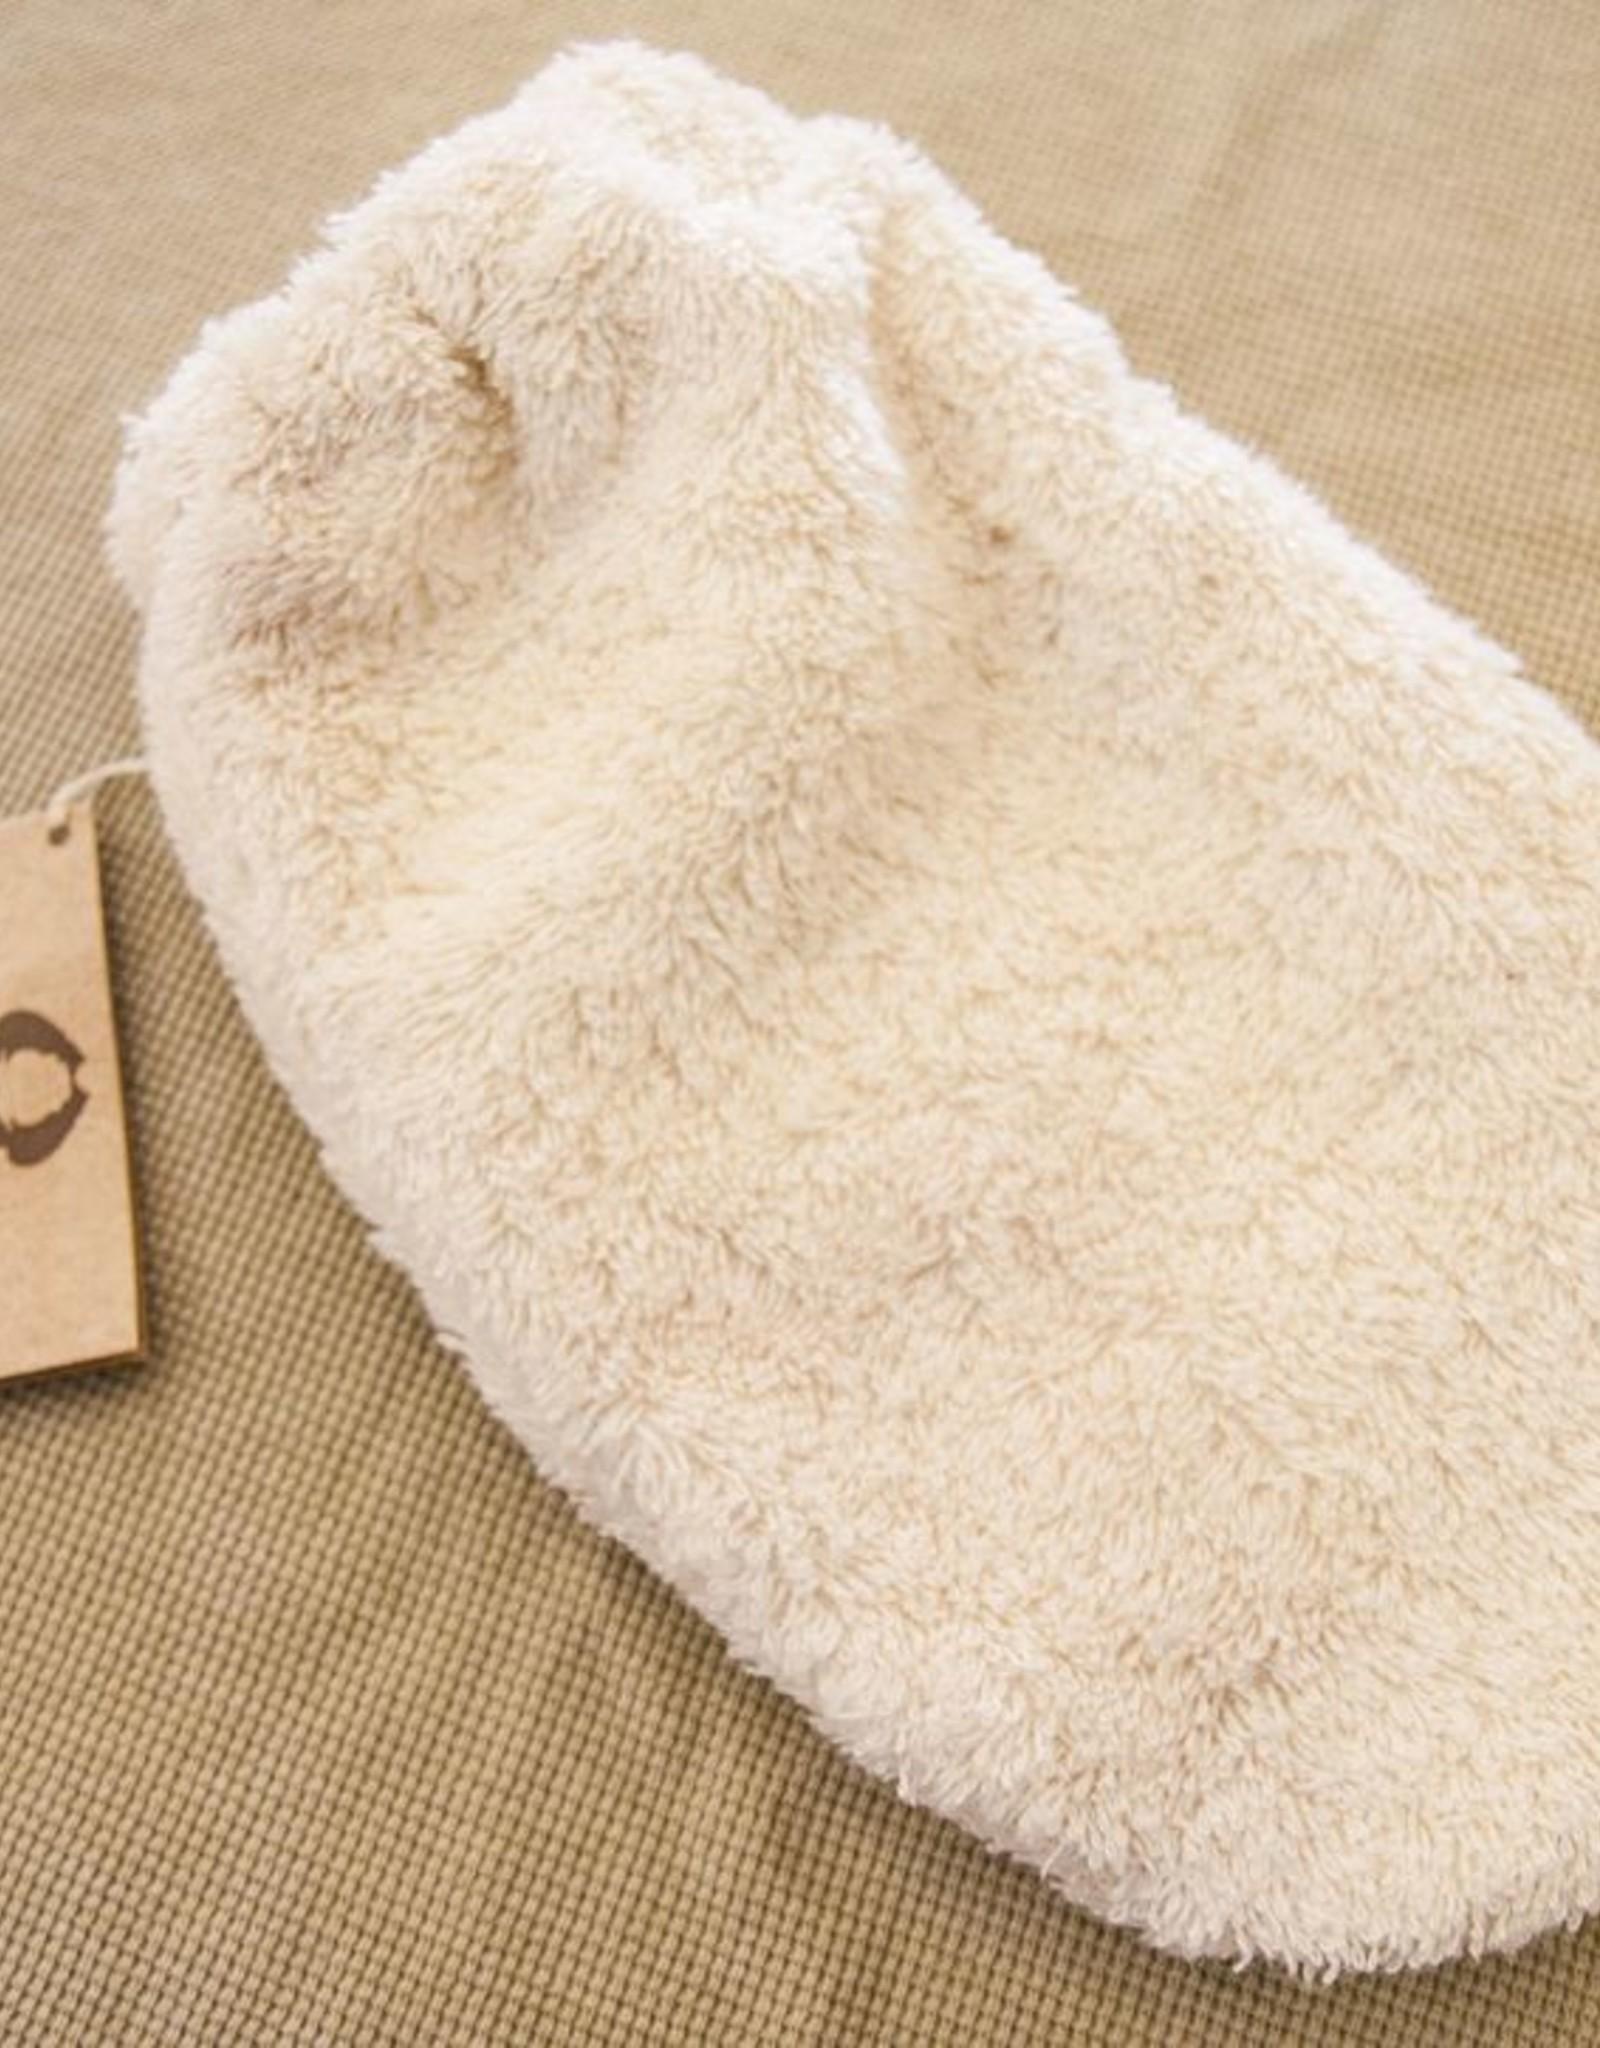 Terry glove for bath